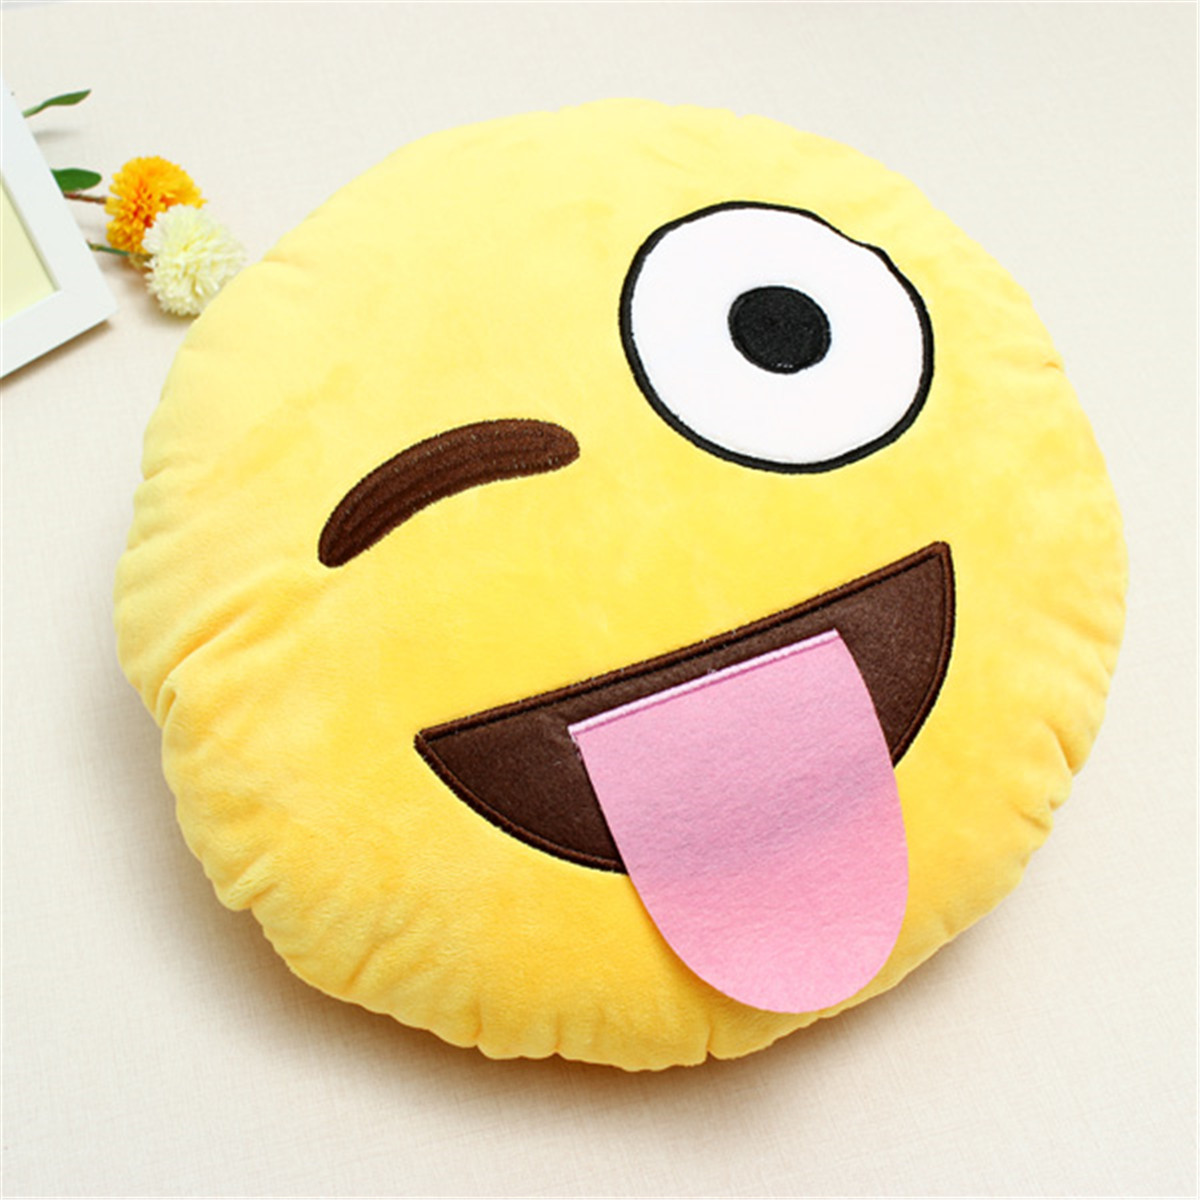 Emoji Smiley Emoticon Yellow Round Cushion Pillow Stuffed Plush Soft Toy Gift